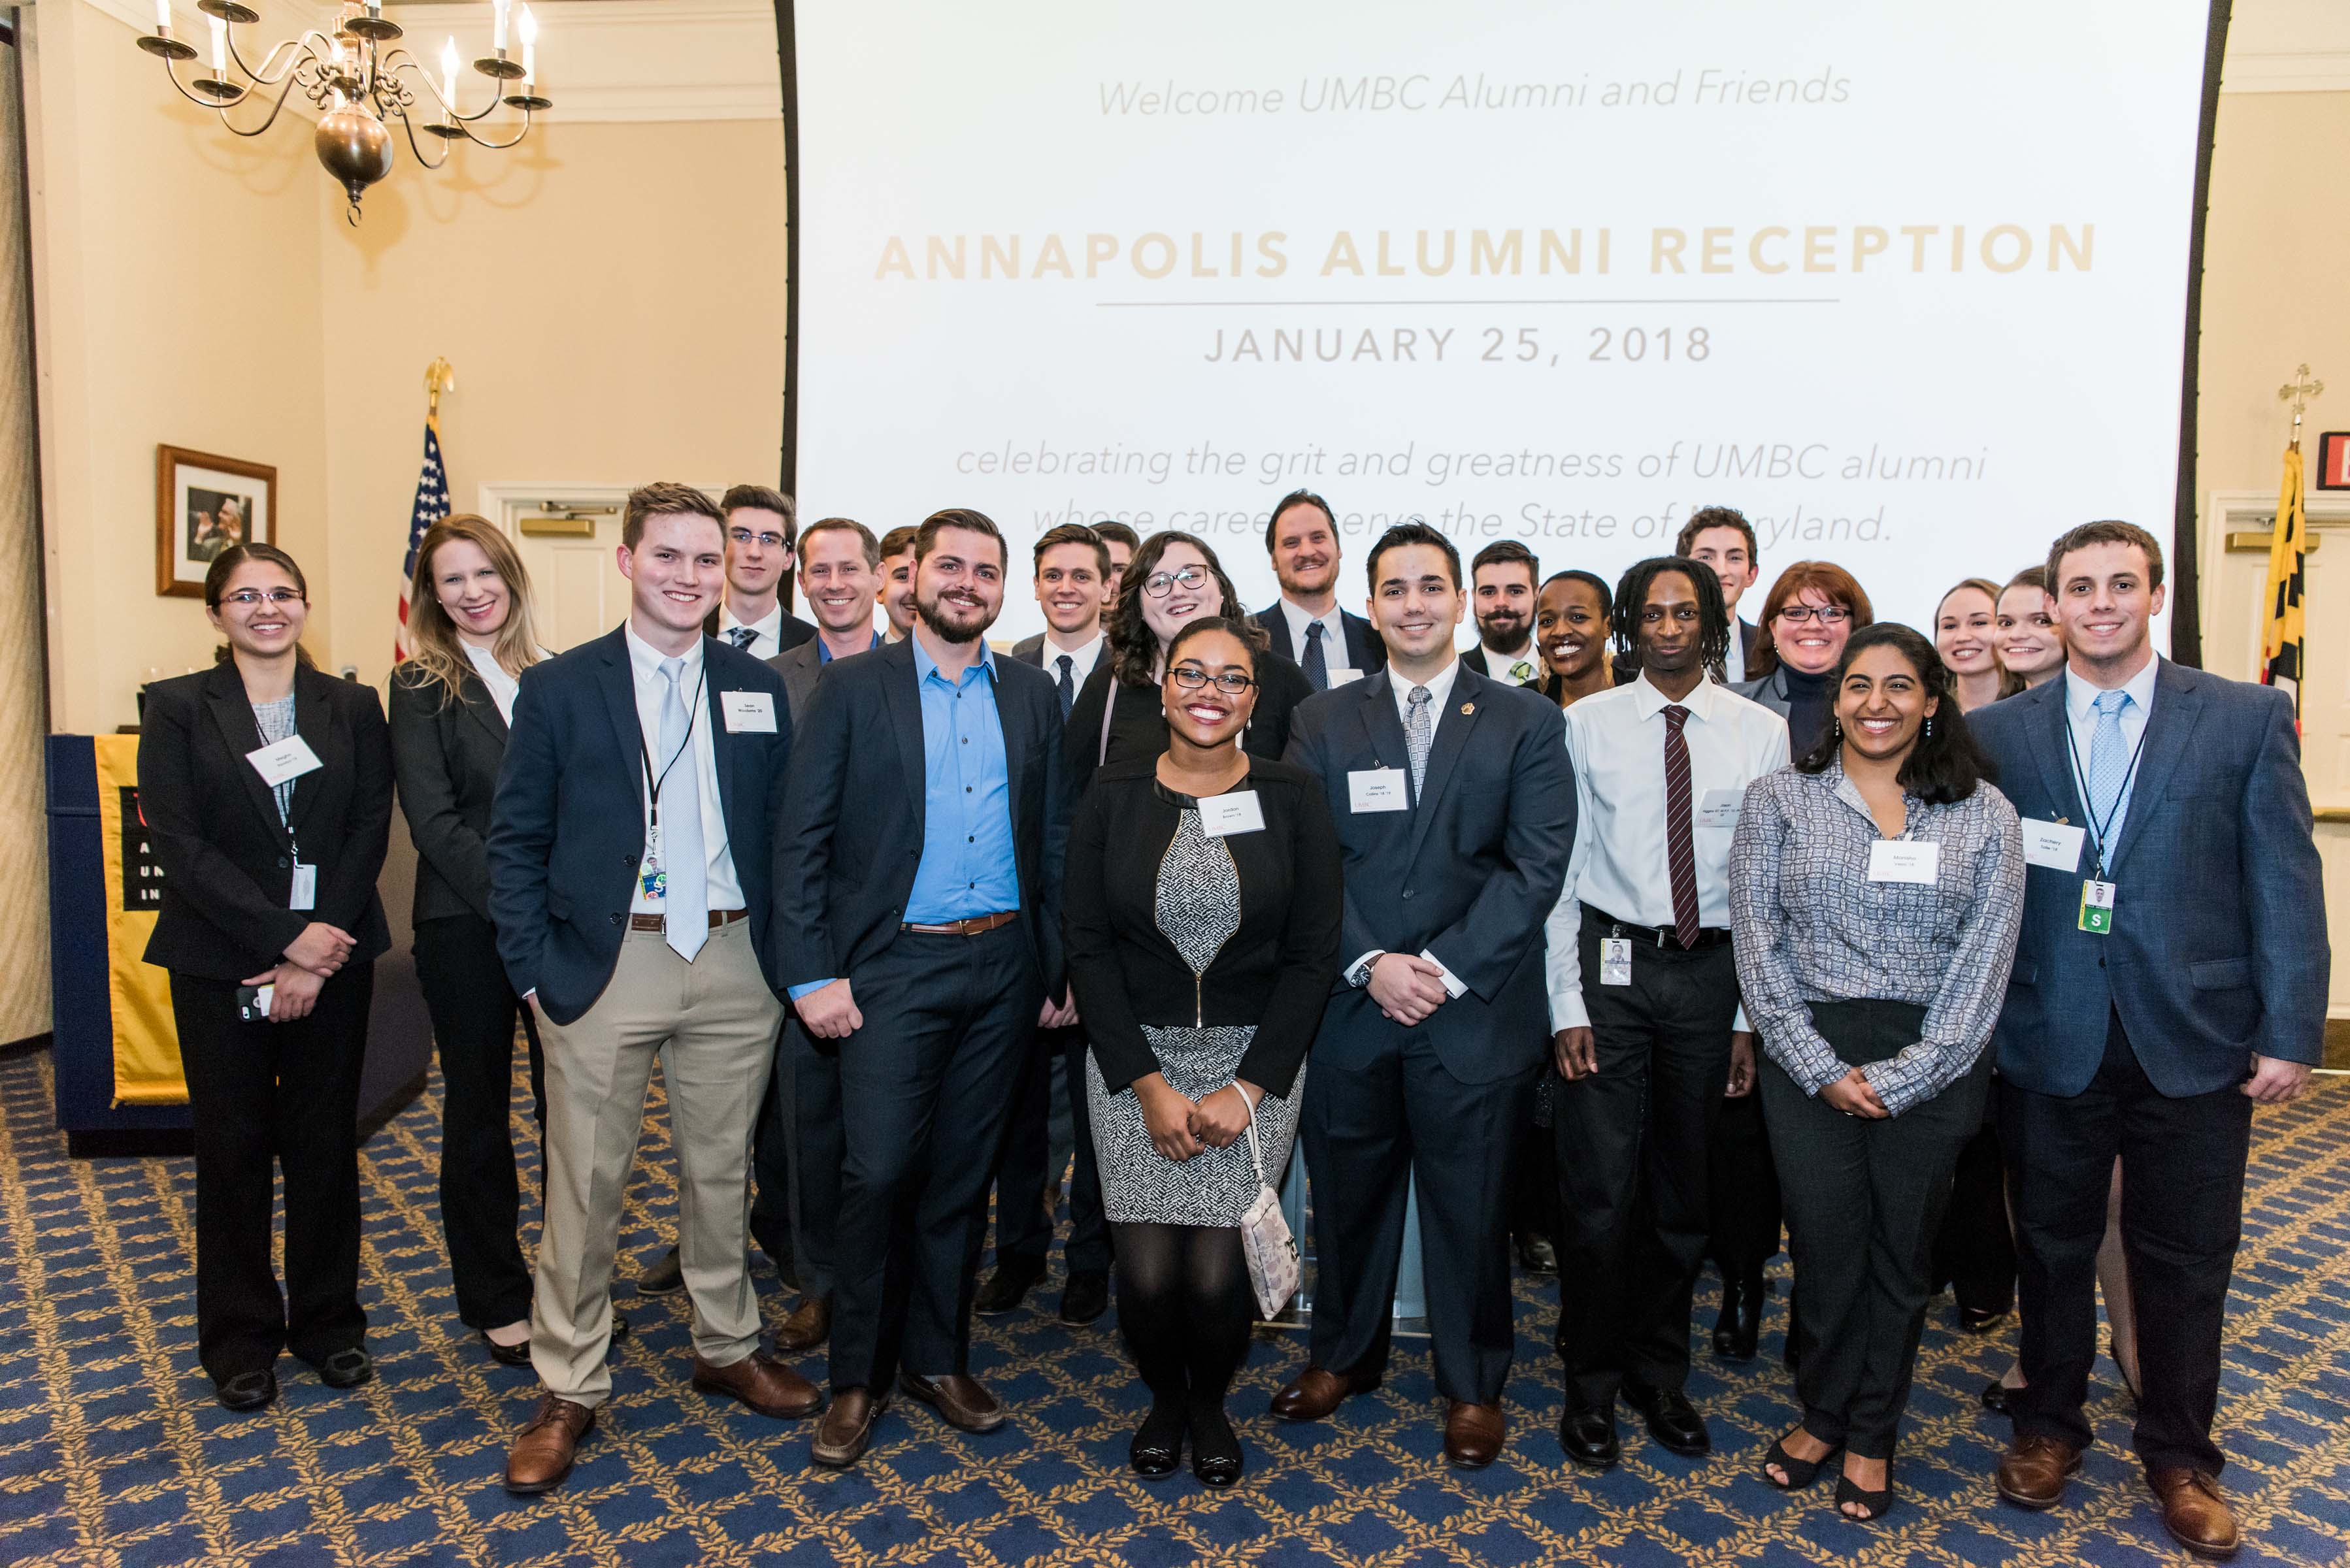 Group poses at Annapolis alumni reception